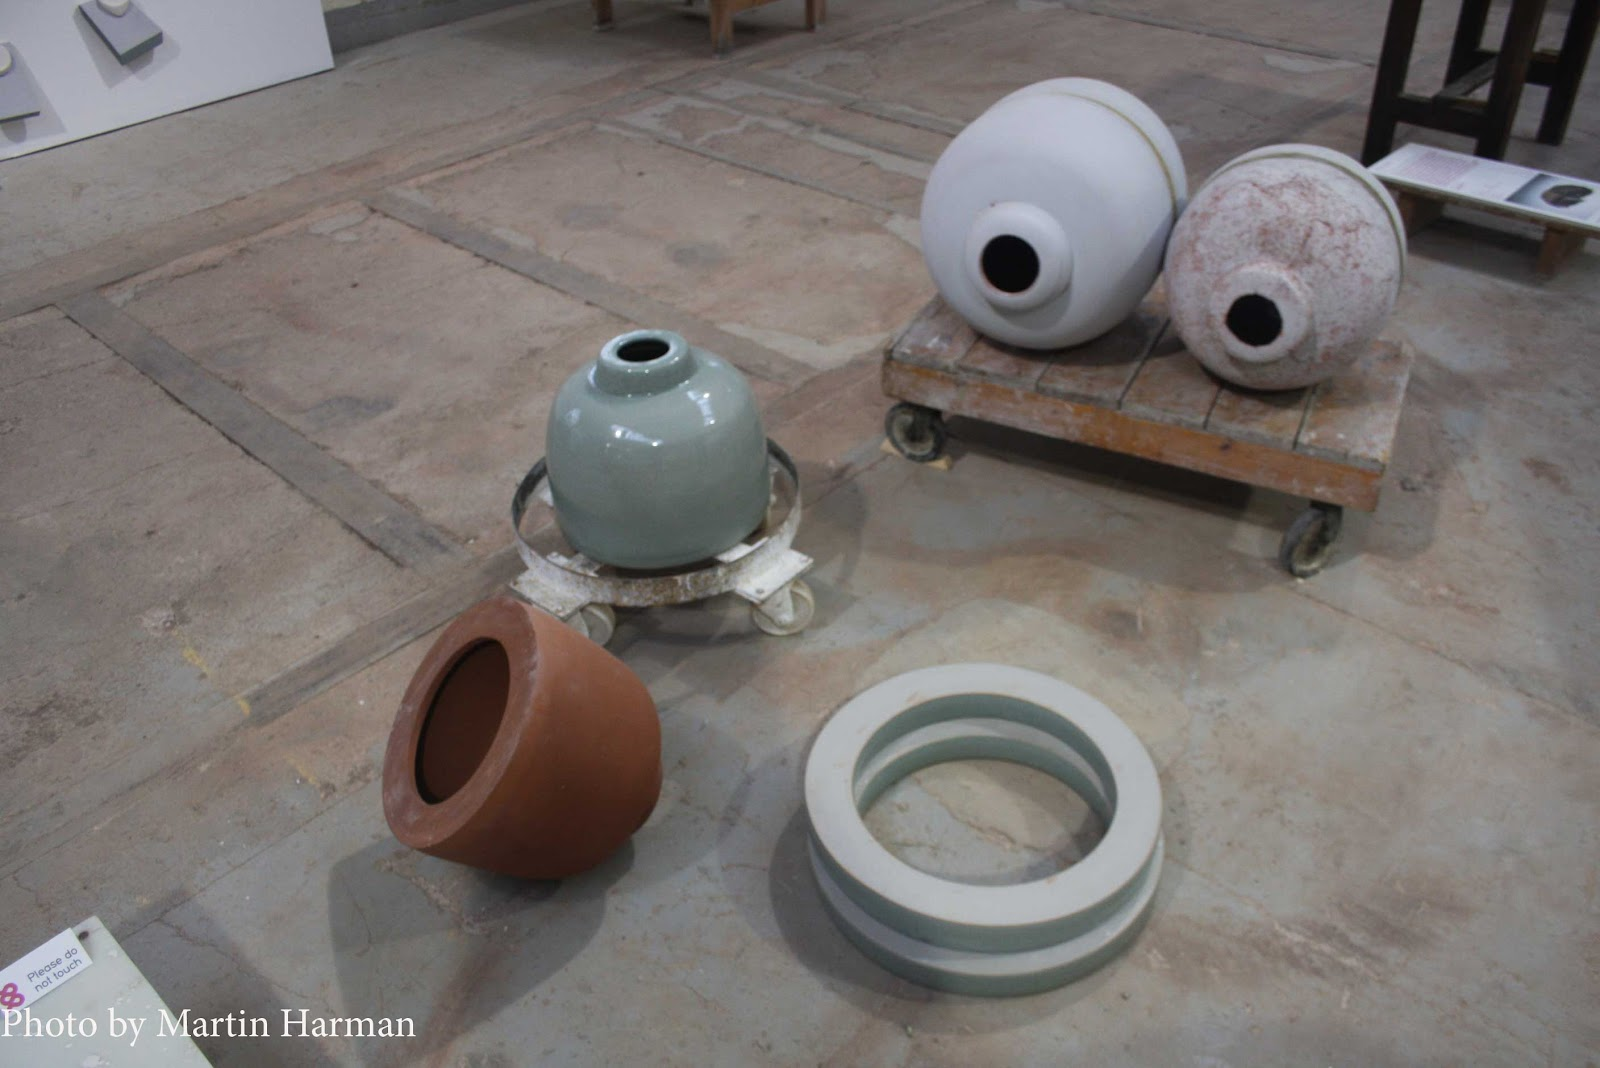 Martin Harman British Ceramics Biennial 2011 Pictures